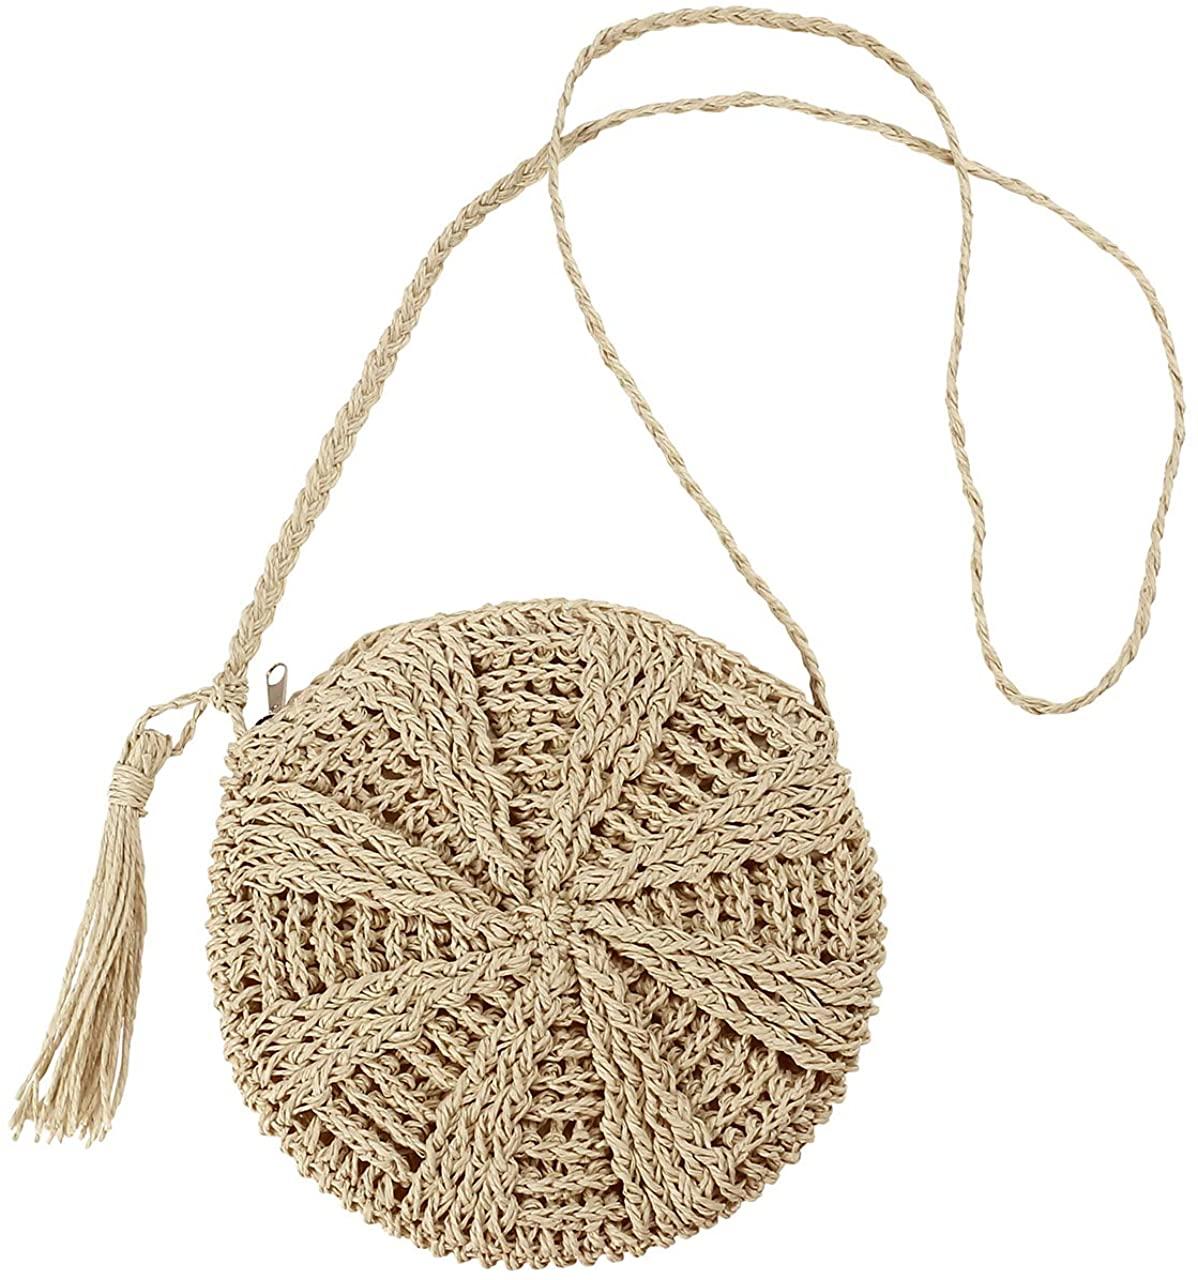 CHIC DIARY Straw Crossbody Bag Women Weave Rattan Shoulder Bag Beach Shoulder Purse with Tassel